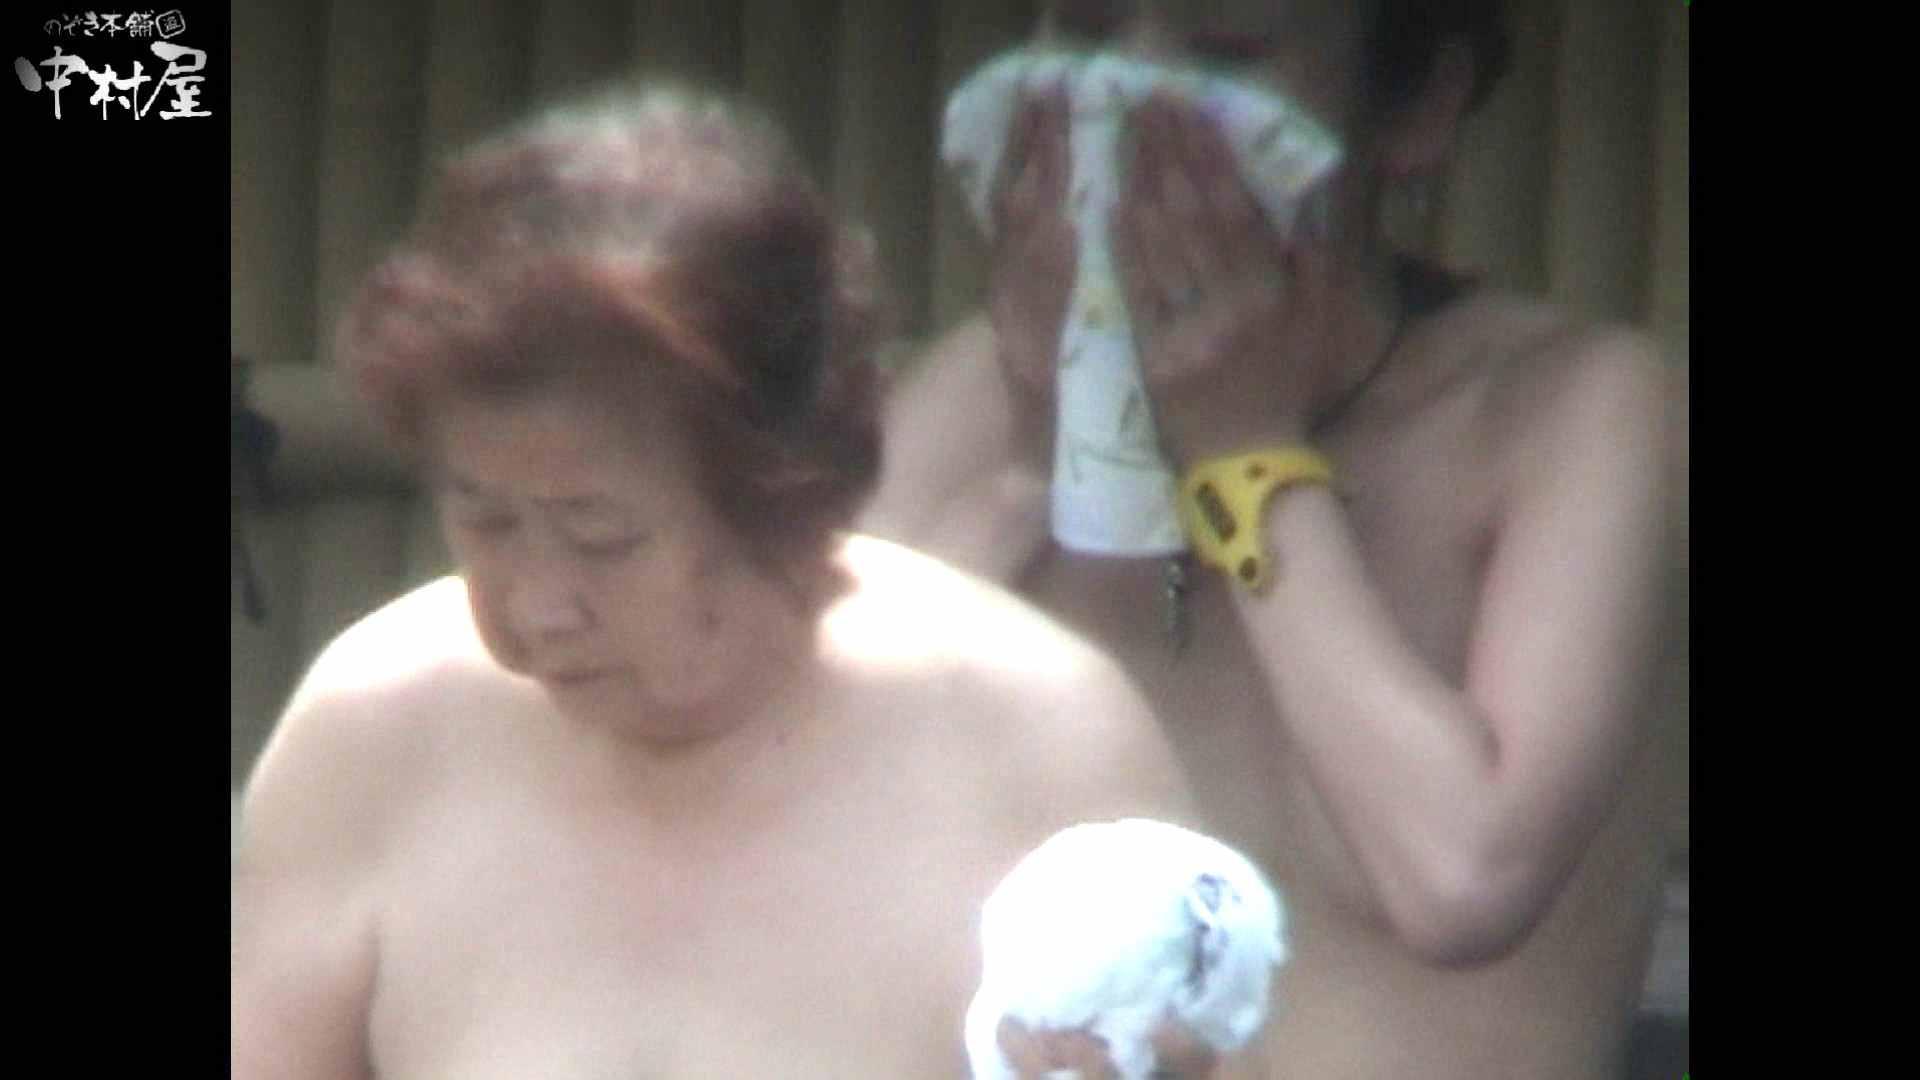 Aquaな露天風呂Vol.934 盗撮シリーズ | 露天風呂編  88PIX 61